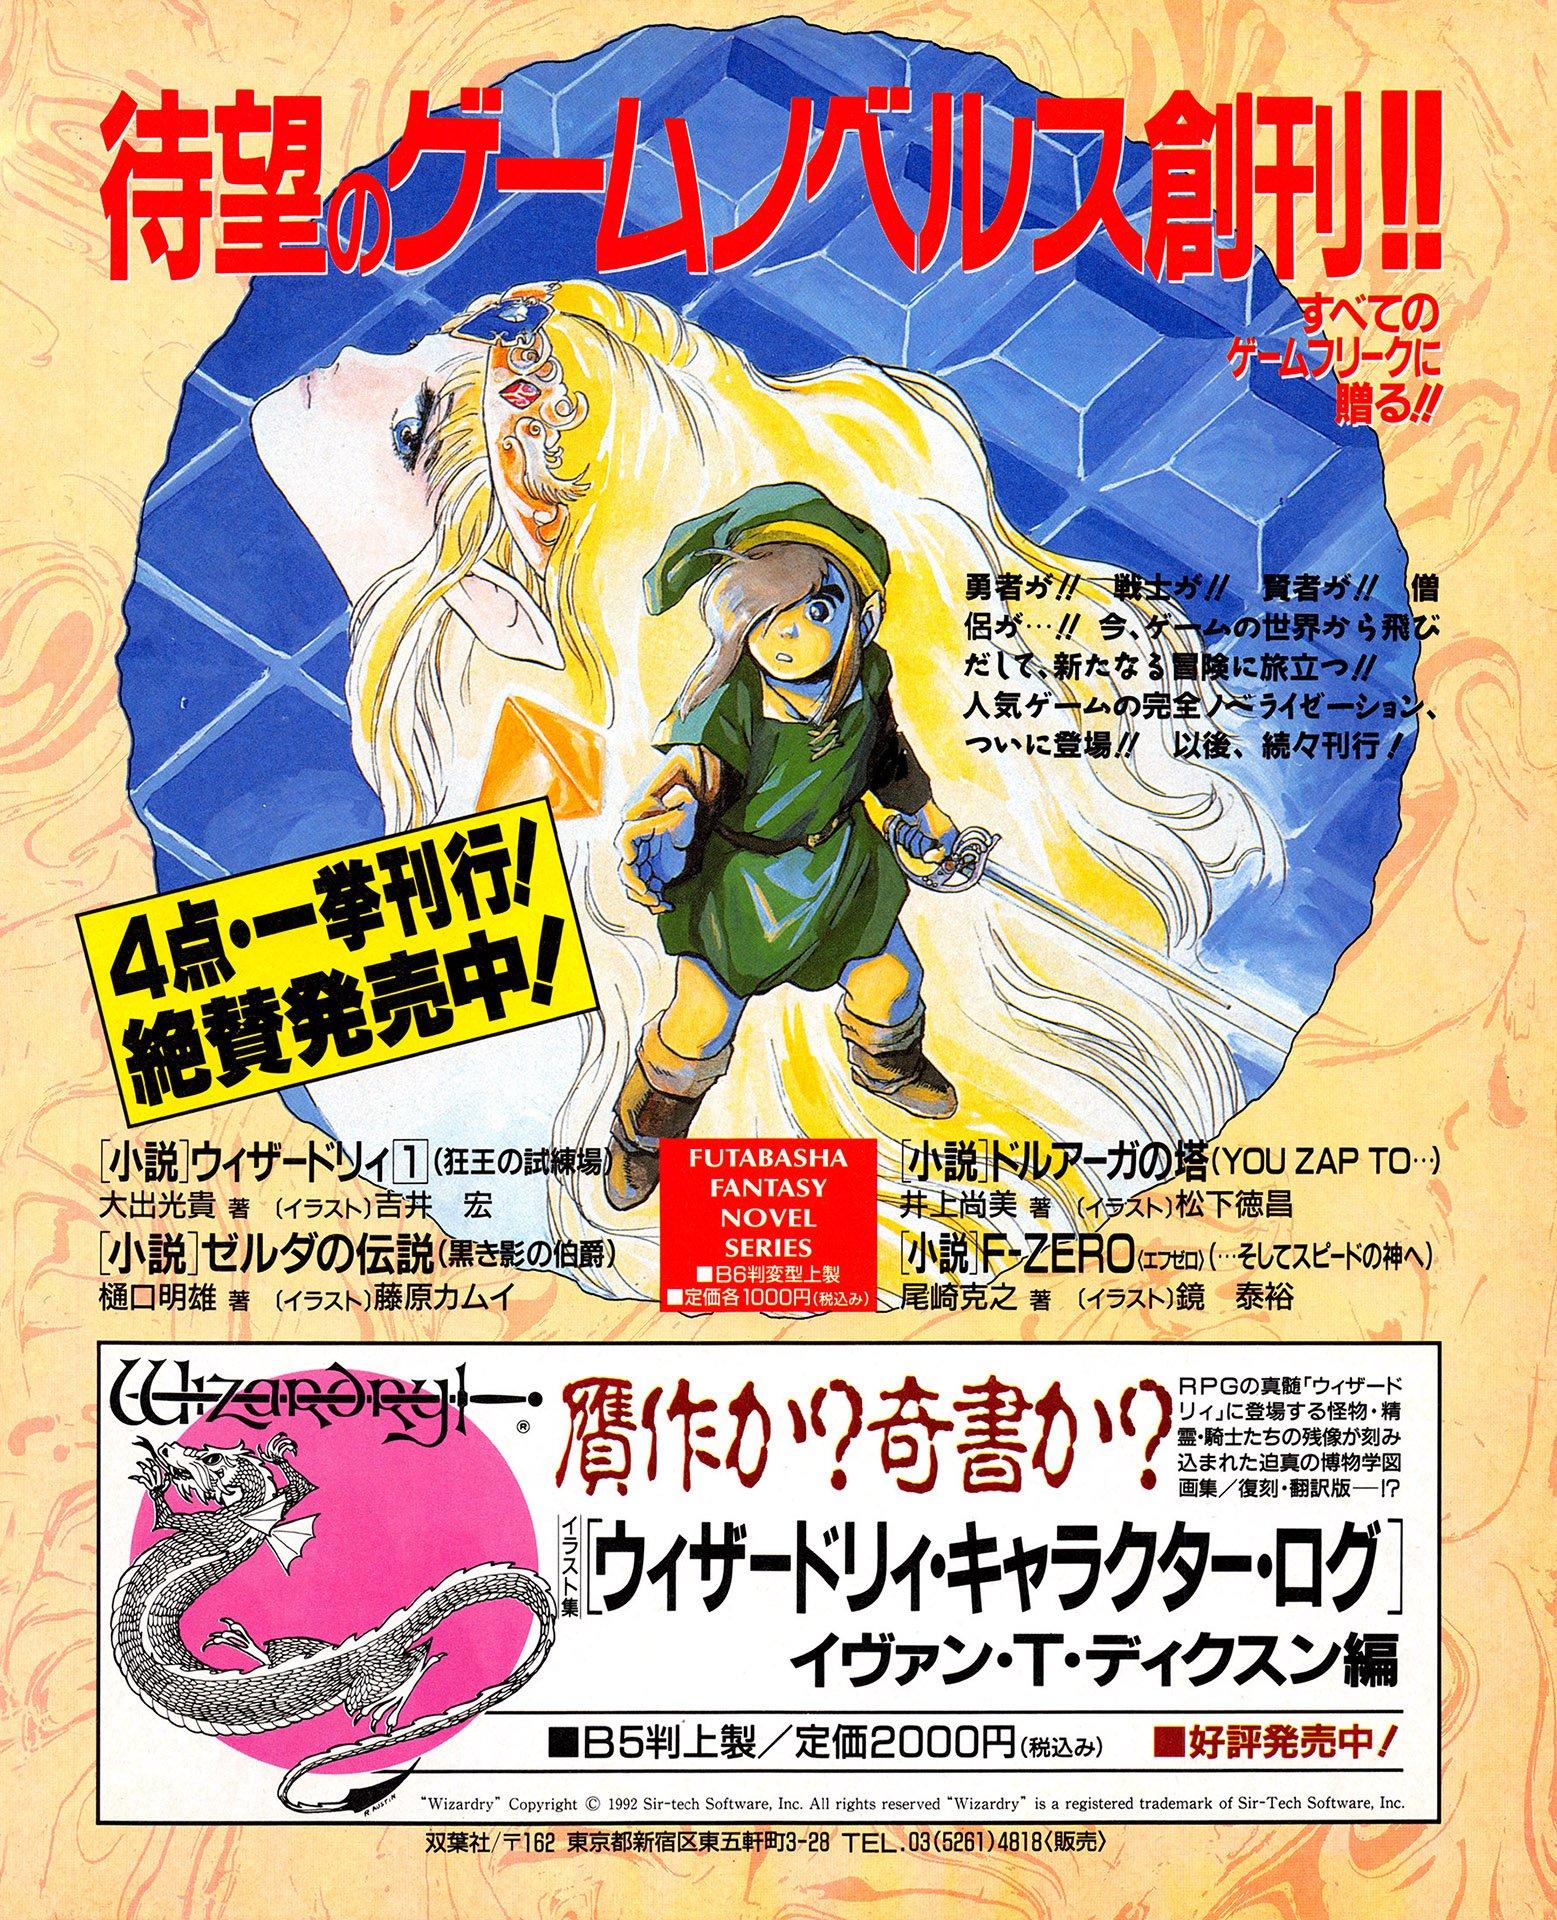 Futabasha Fantasy Novel Series - Wizardry, The Legend of Zelda, The Tower of Druaga, F-Zero (Japan)